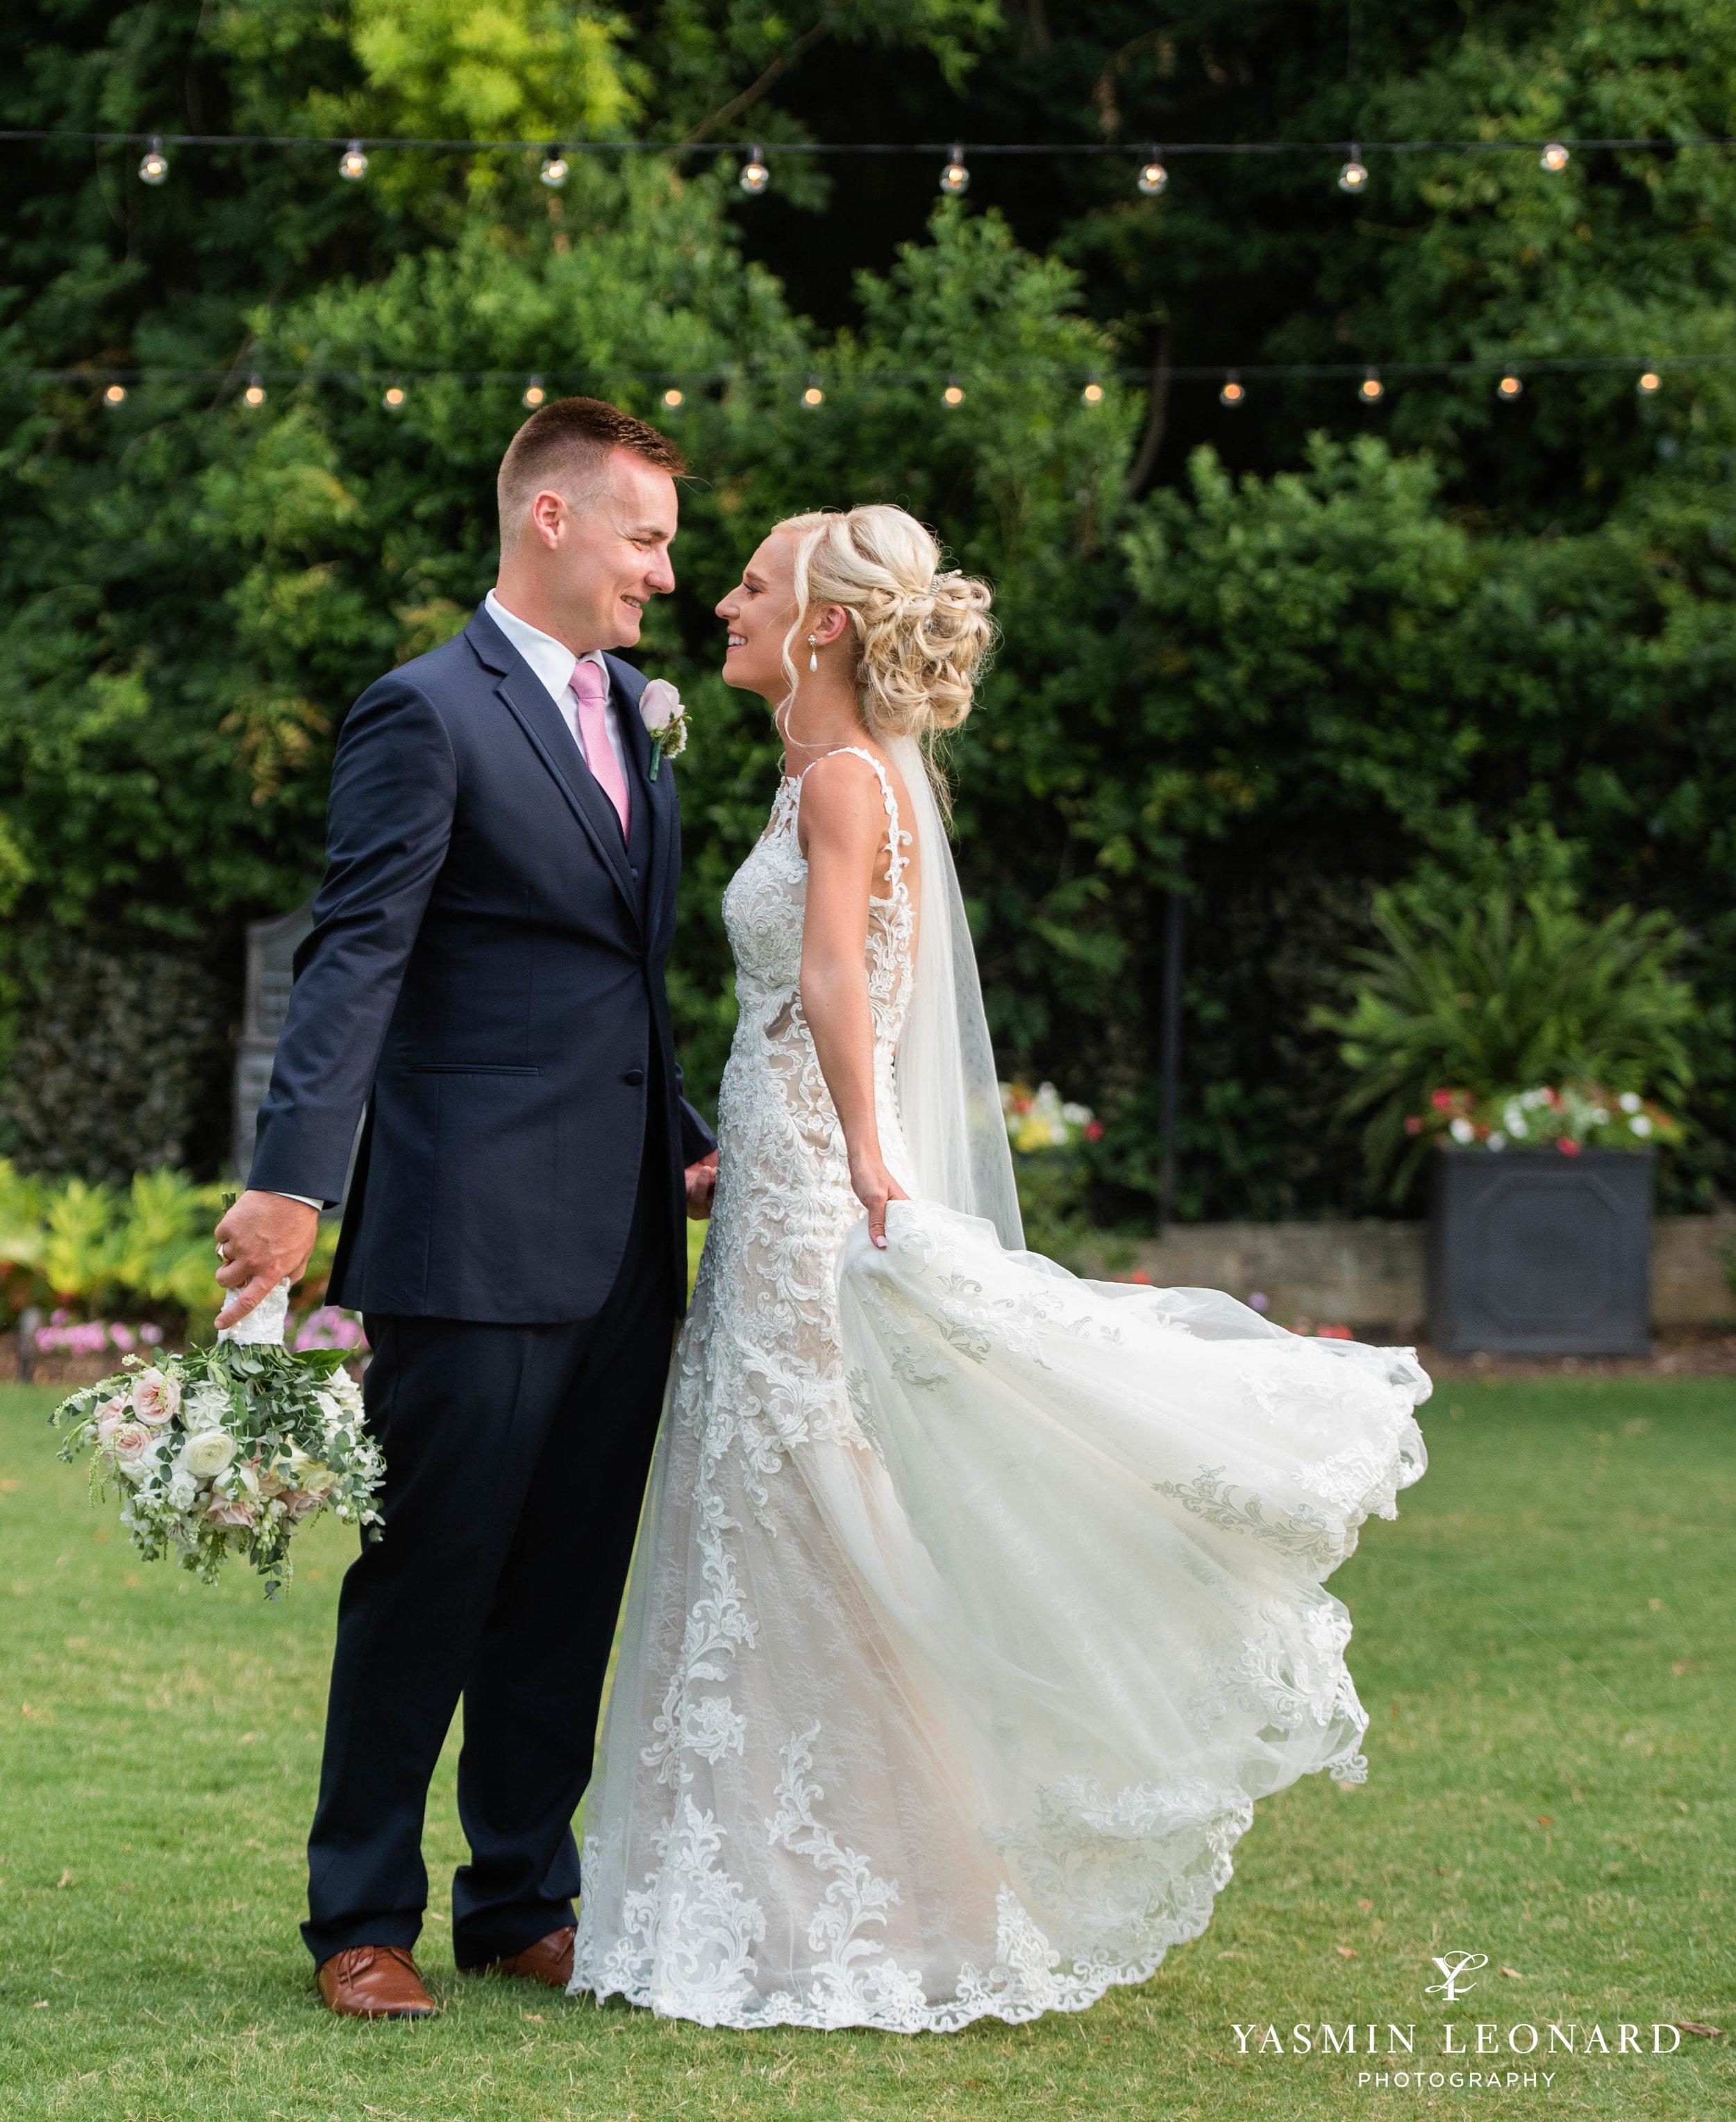 Separk Mansion - NC Weddings - Gastonia Wedding - NC Wedding Venues - Pink and Blue Wedding Ideas - Pink Bridesmaid Dresses - Yasmin Leonard Photography-30.jpg